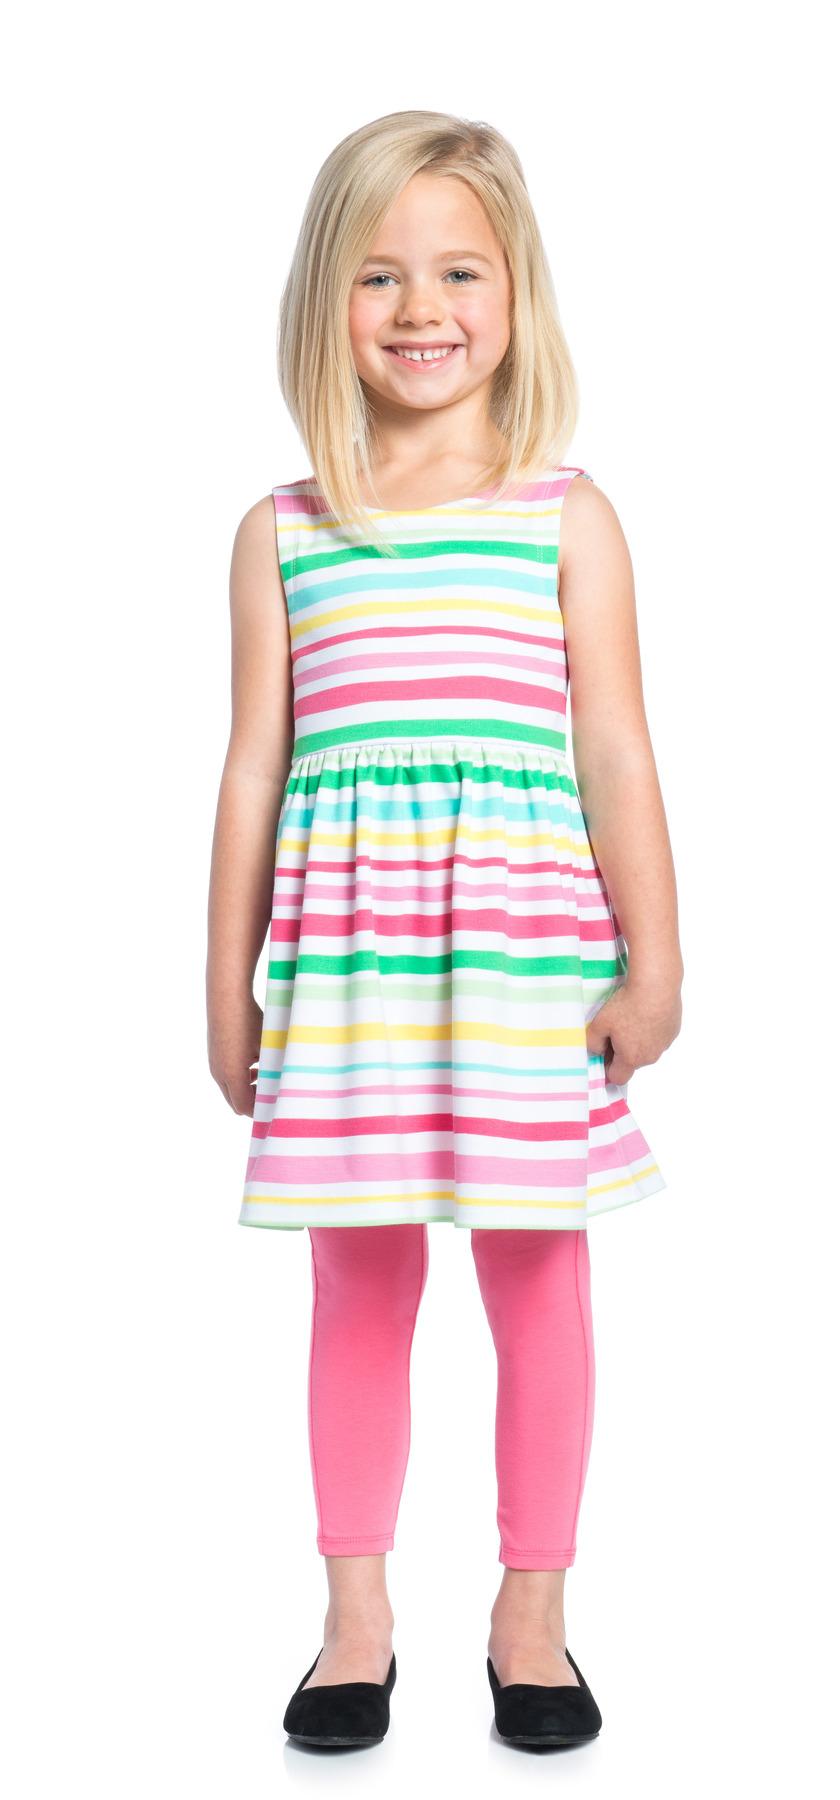 002e00e20a42 Pretty In Stripes Outfit - FabKids